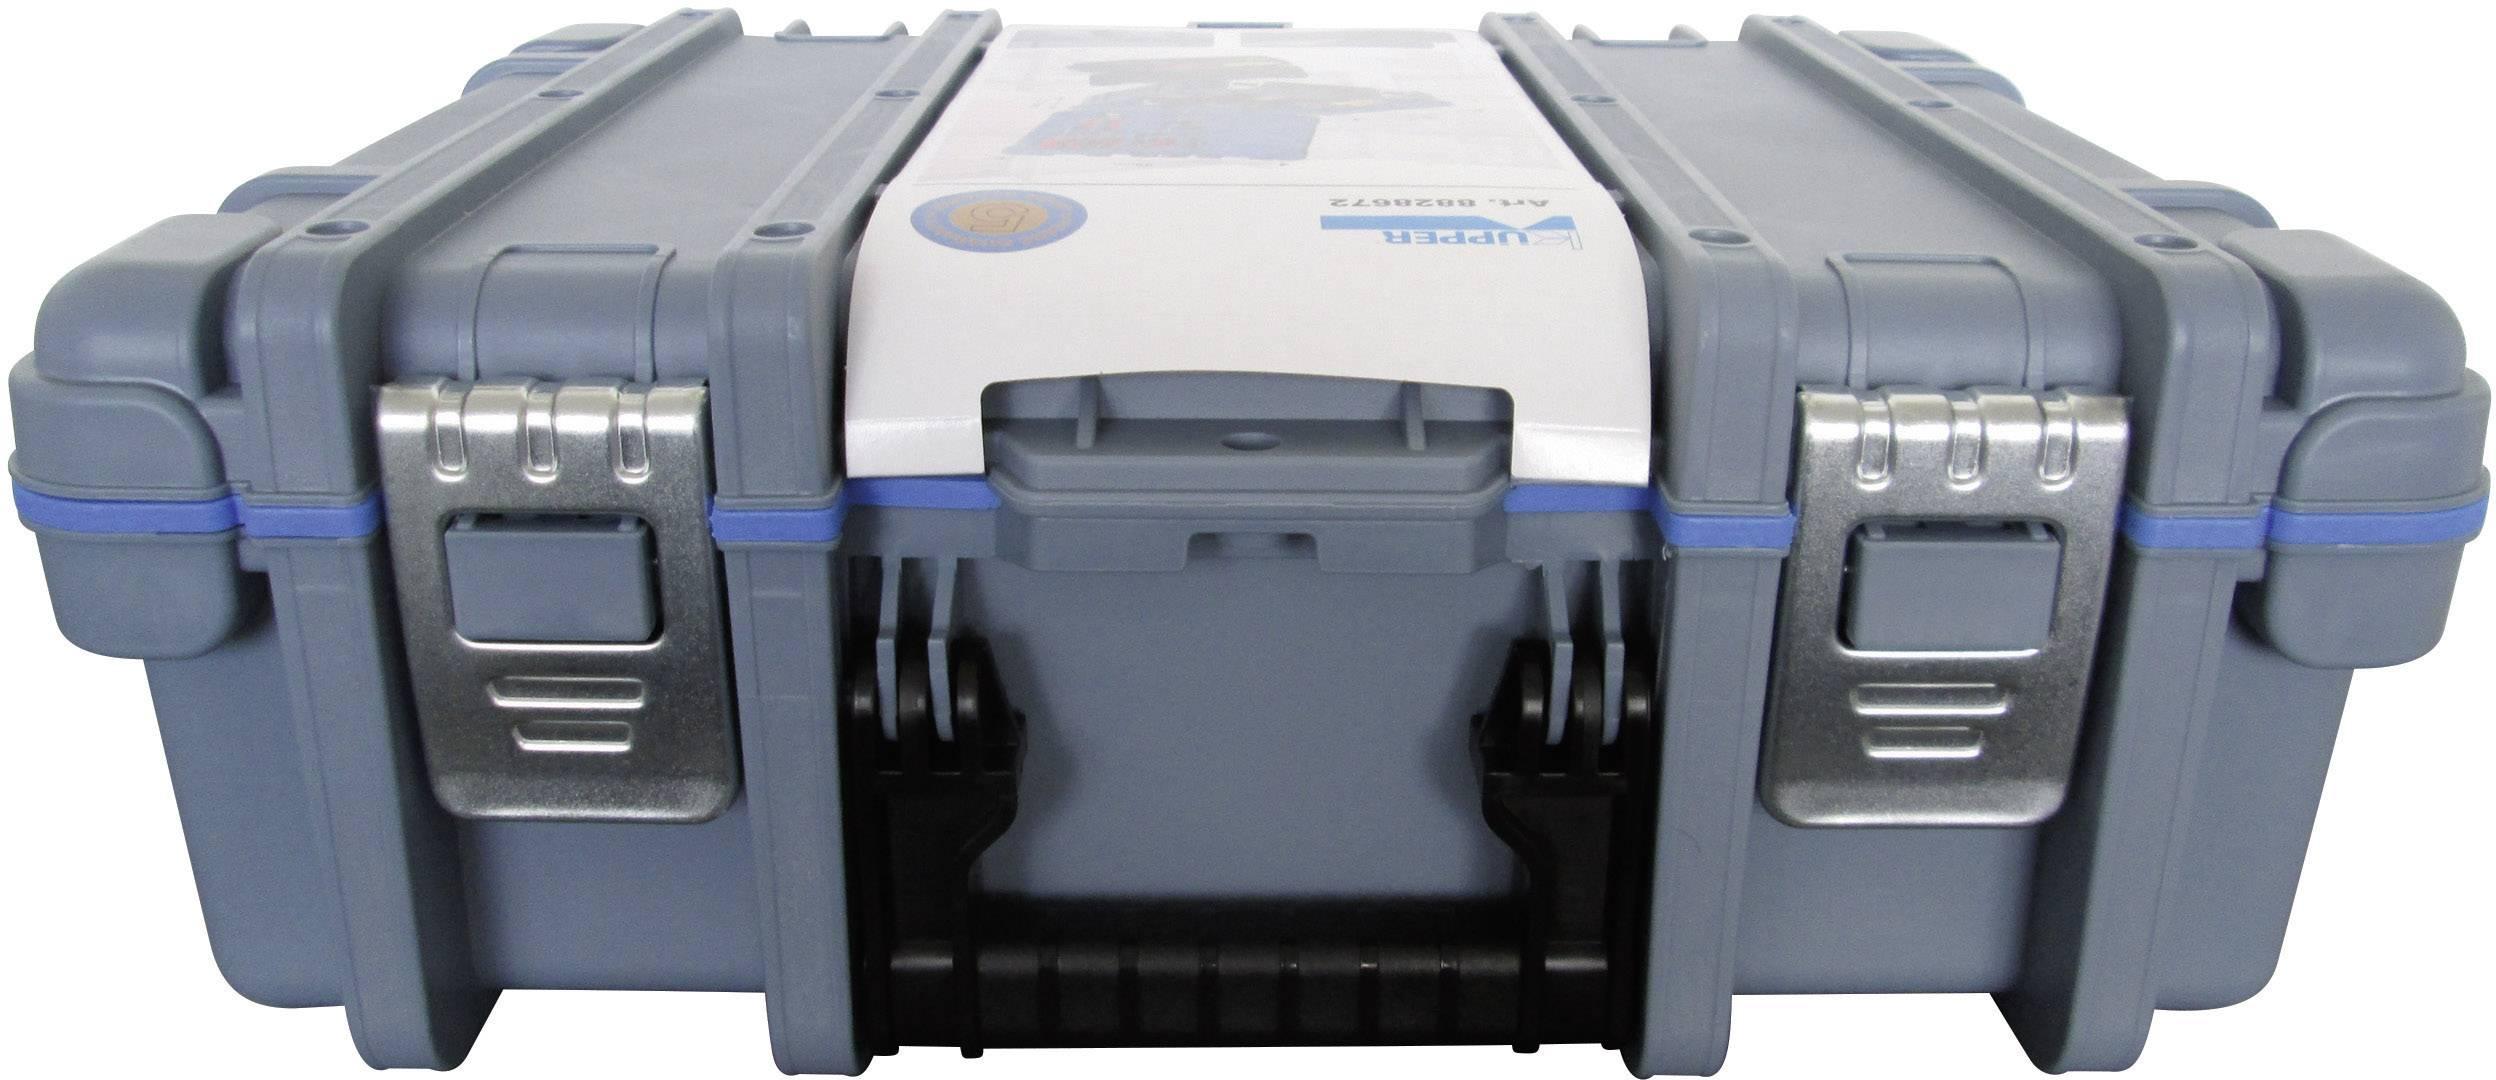 Elektrikársky kufor na náradie Küpper 50050, 480 x 380 x 178 mm